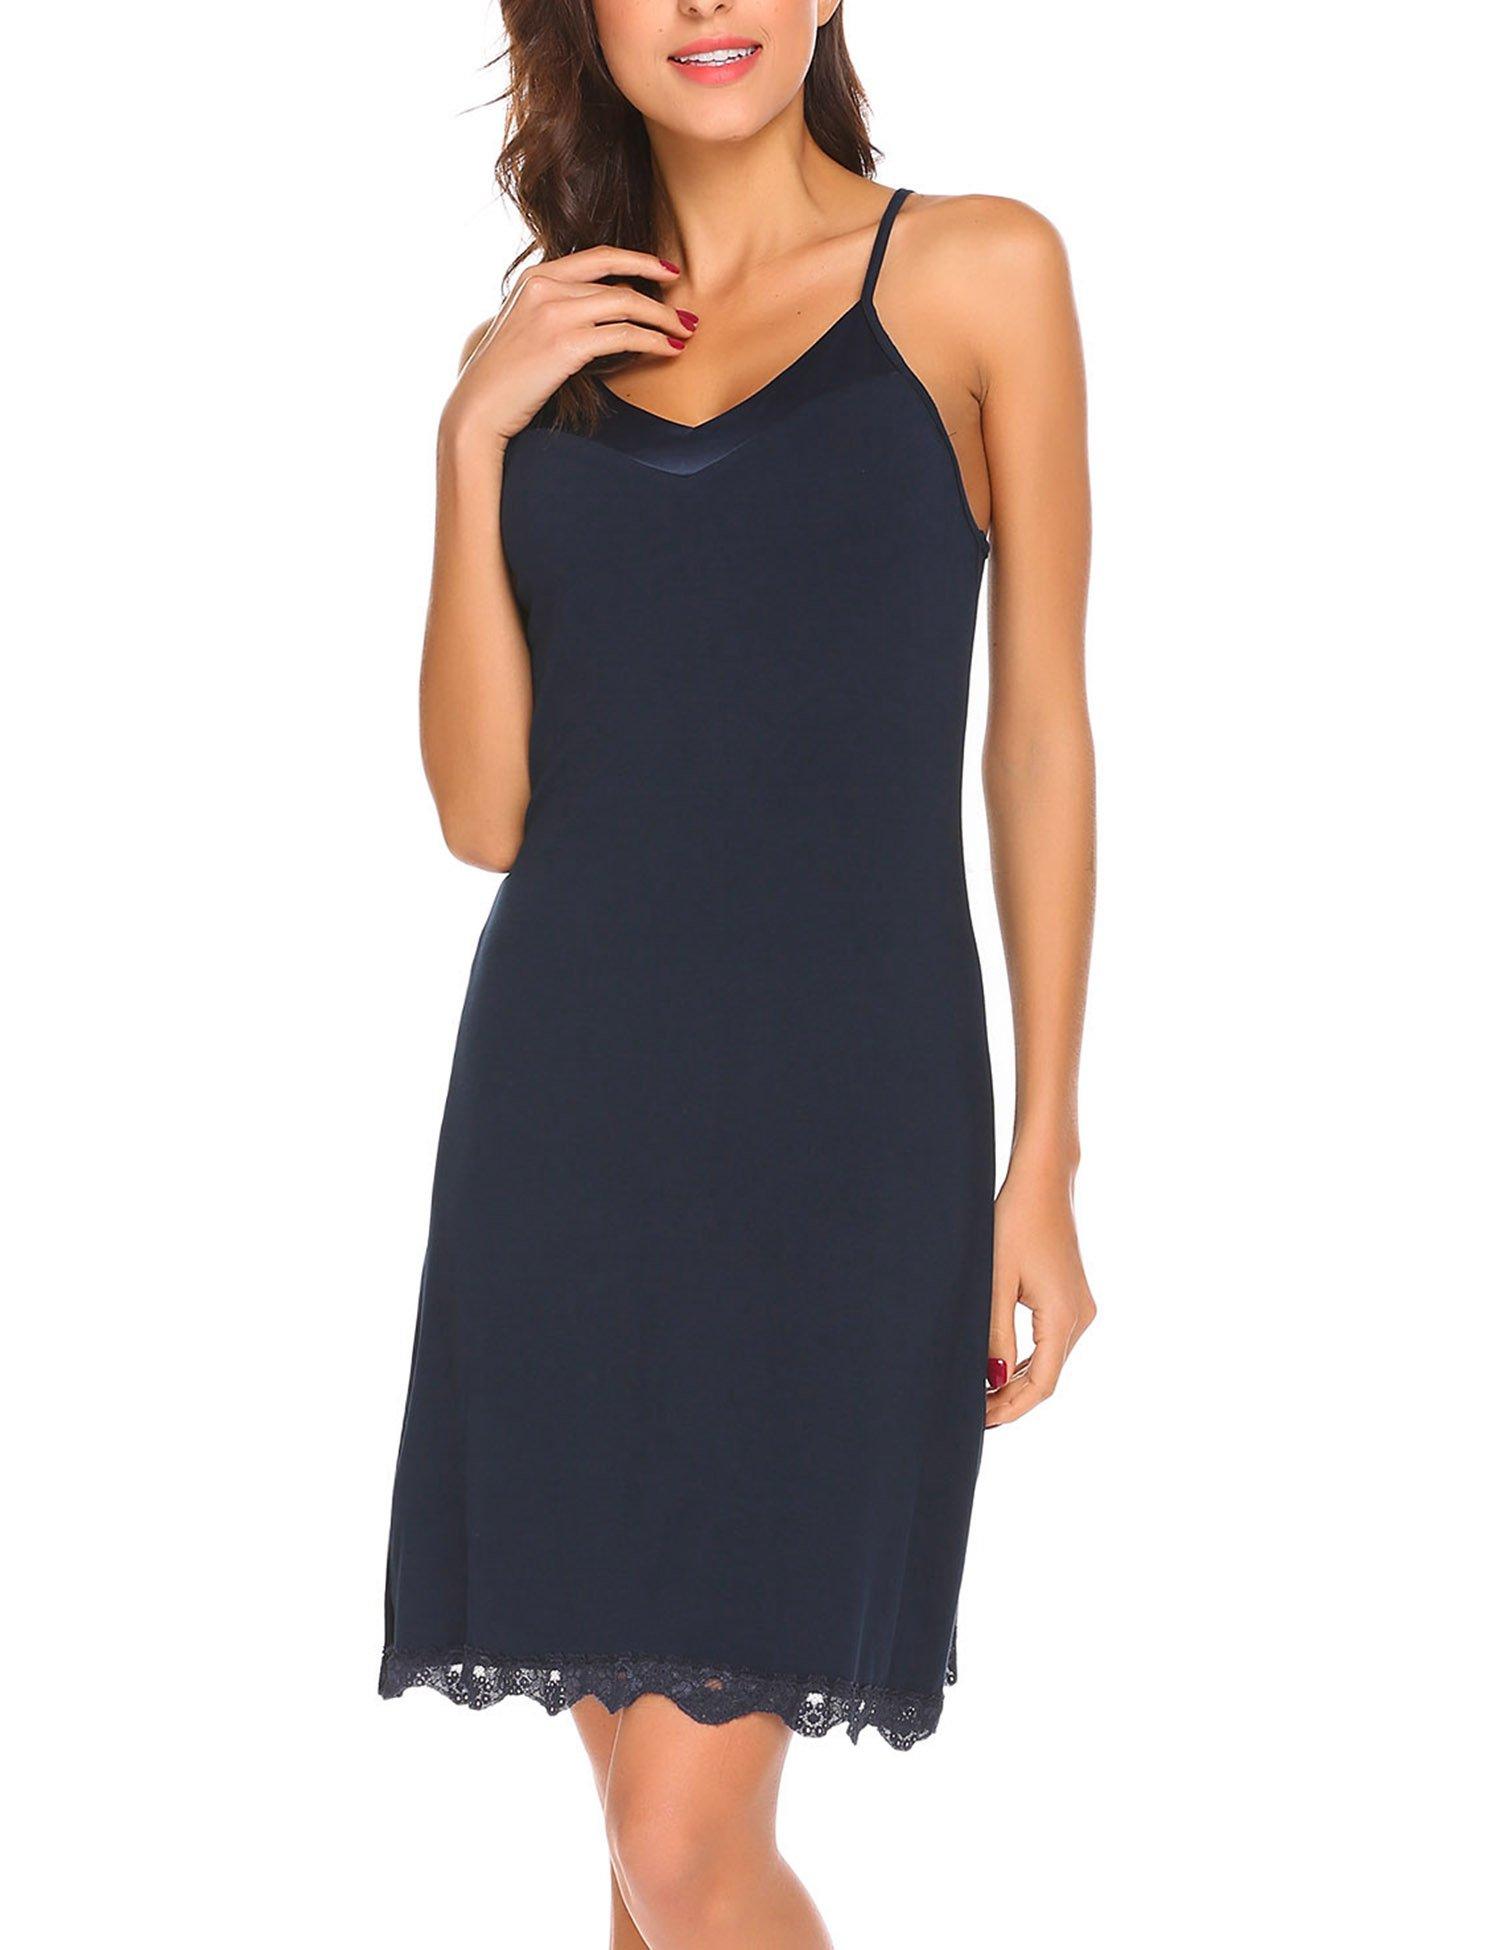 MAXMODA Women's Sexy Lingerie Sleepwear Satin Lace Chemise Nightgown